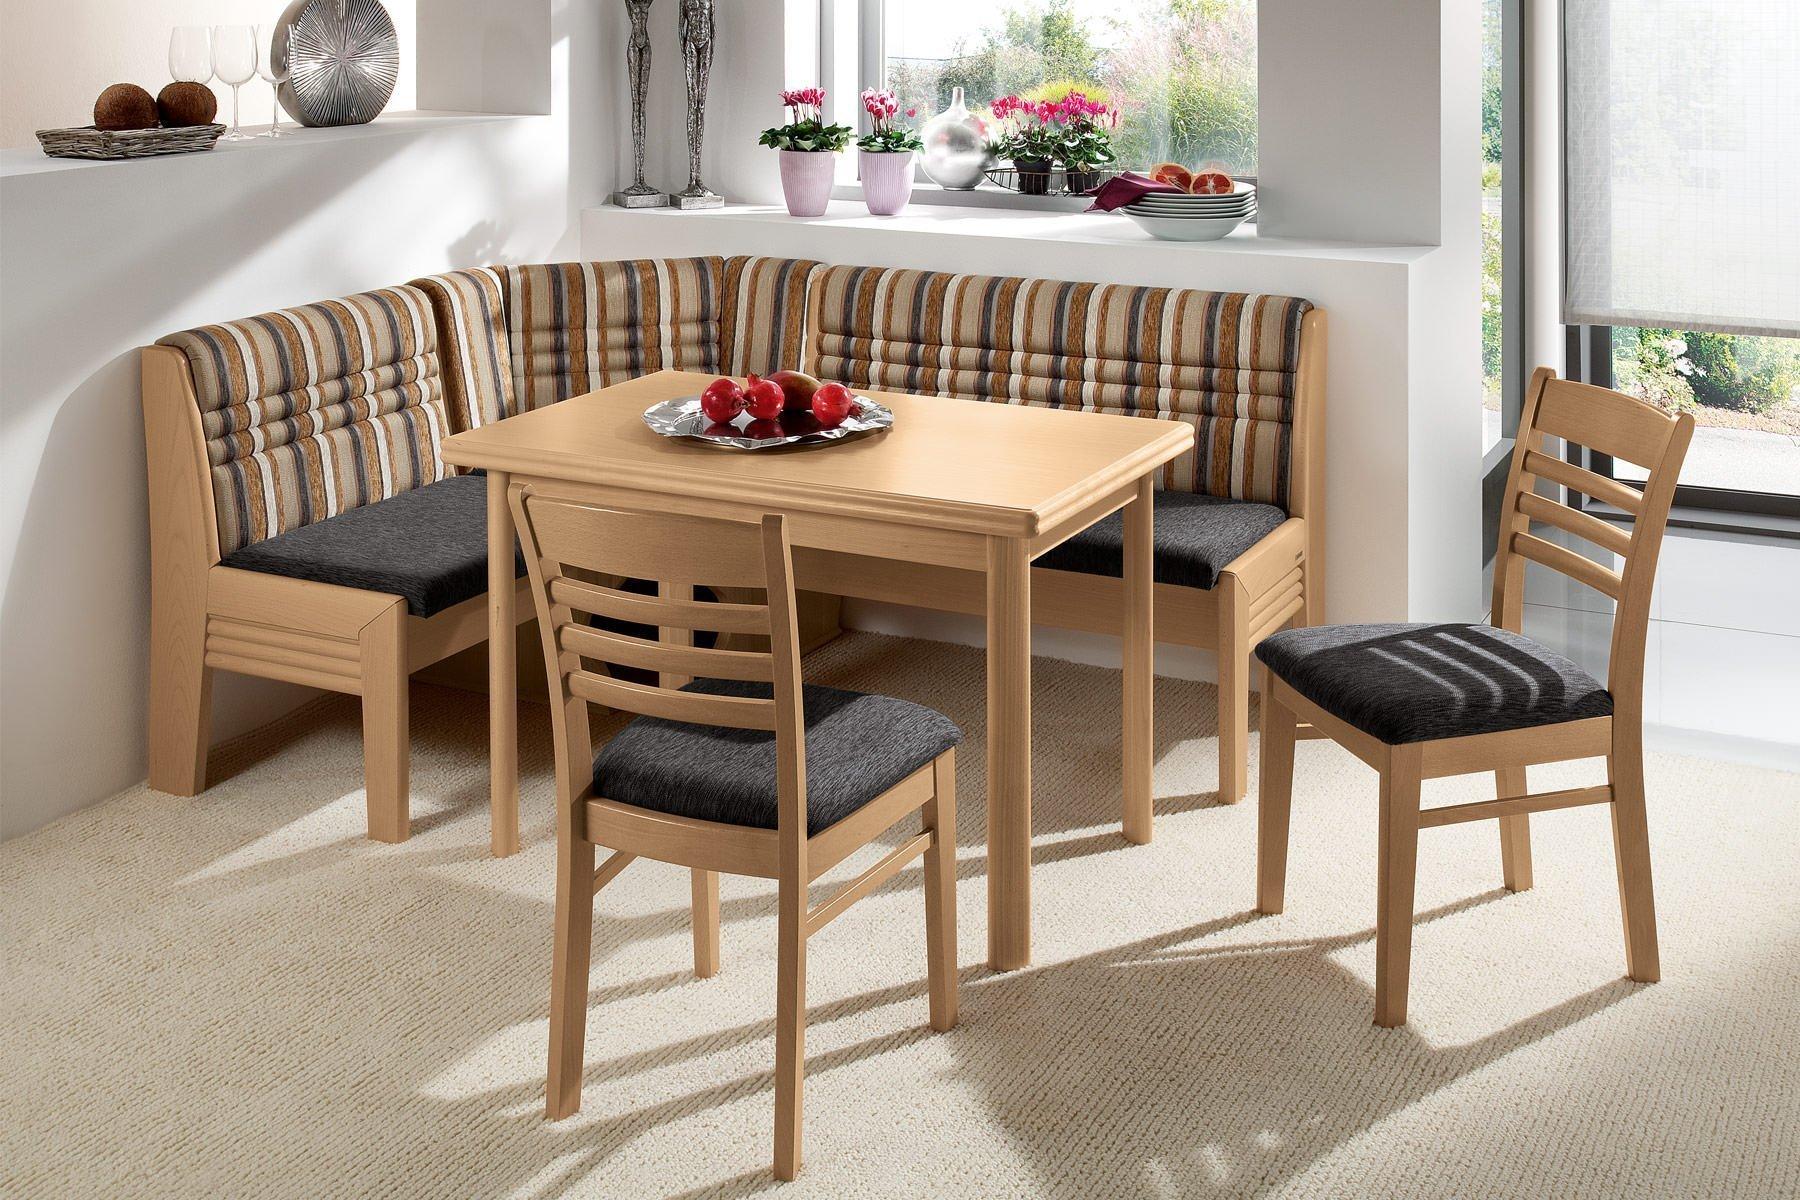 кухонная скамья с обивкой